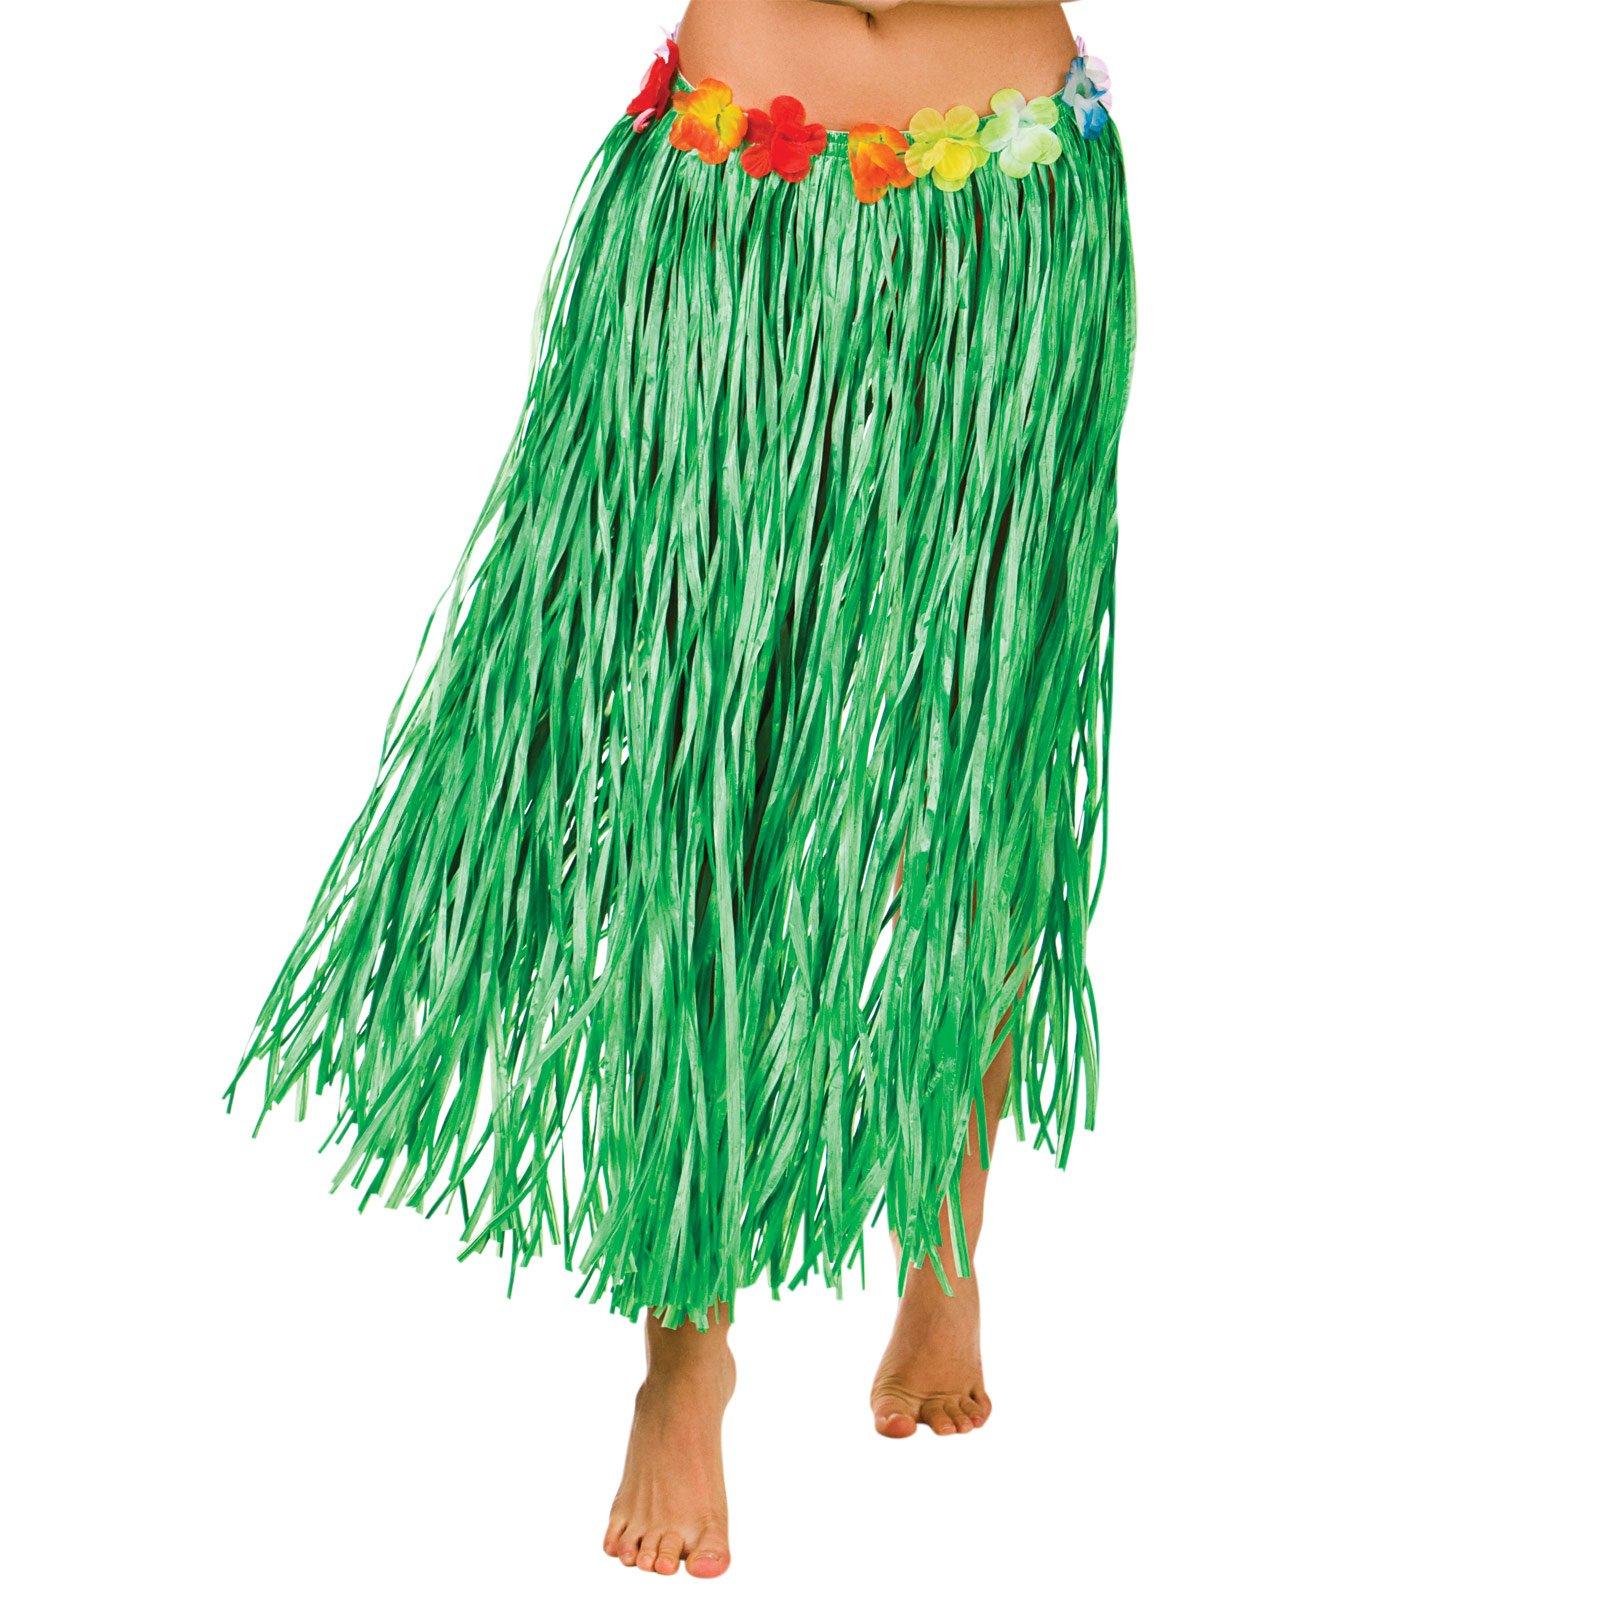 Plain Adults Grass Hawaain Skirt Fancy Dress Adult Hawaiian Budget